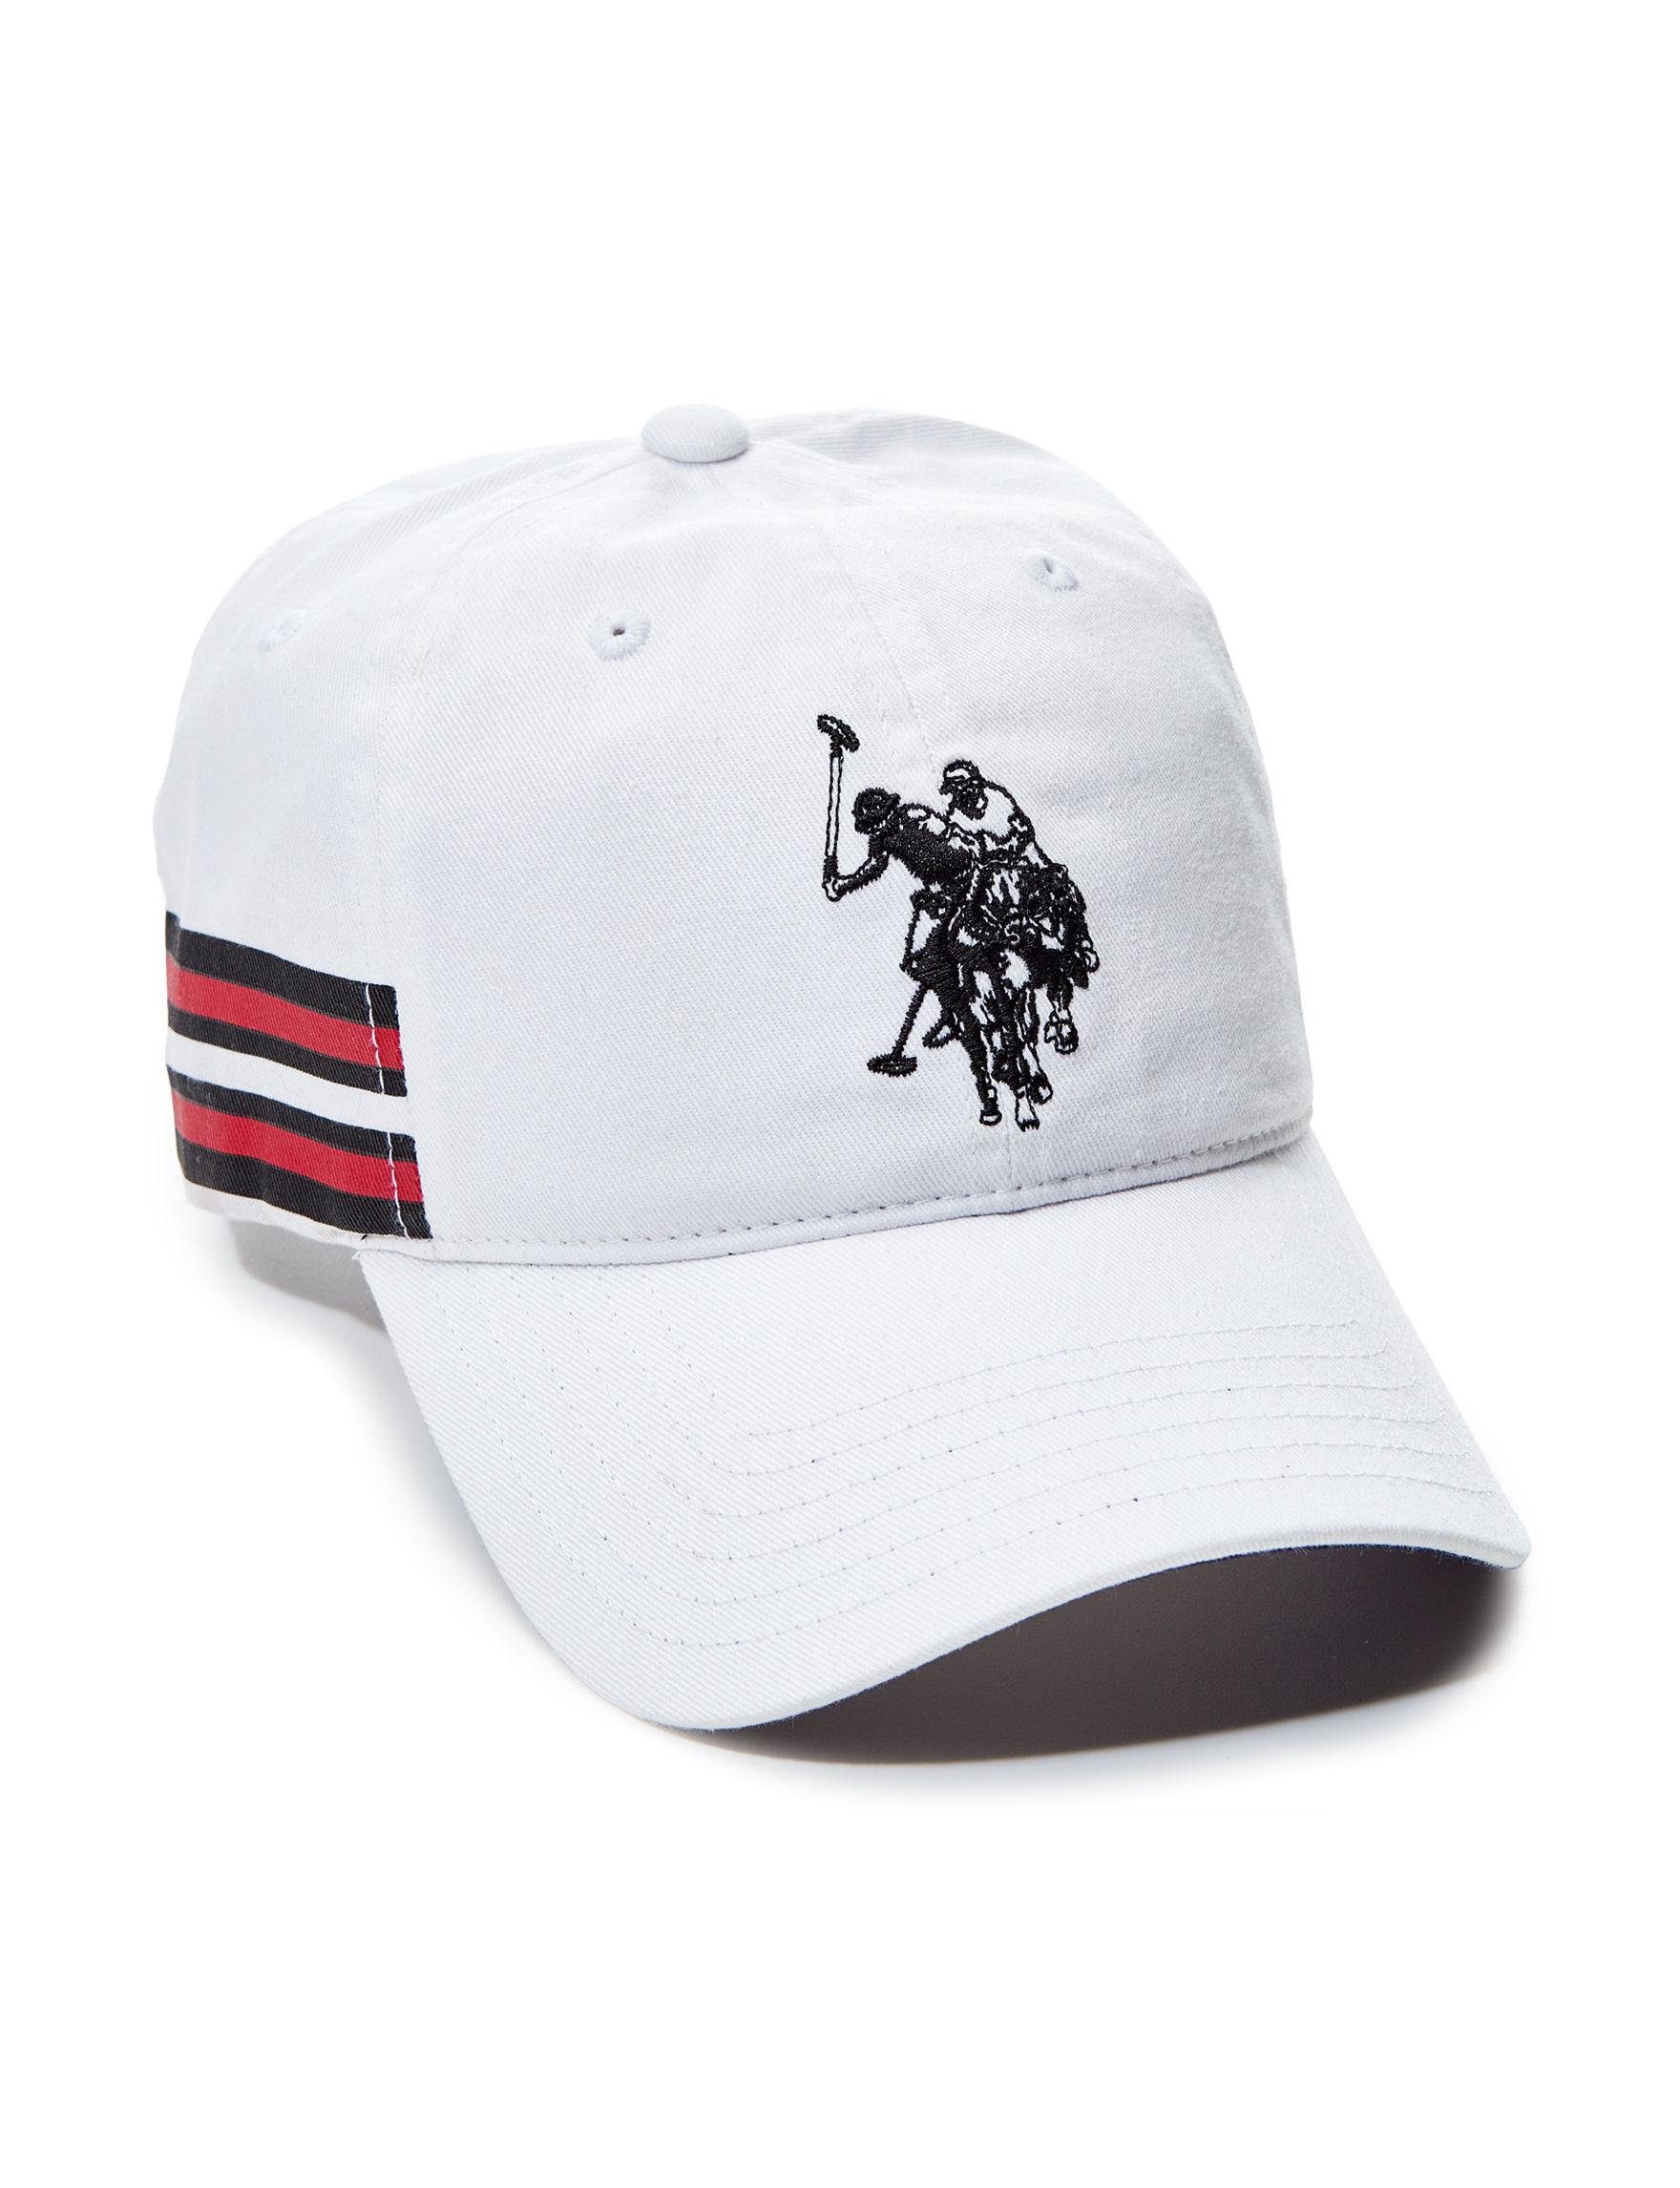 U.S. Polo Assn. White Hats & Headwear Baseball Caps